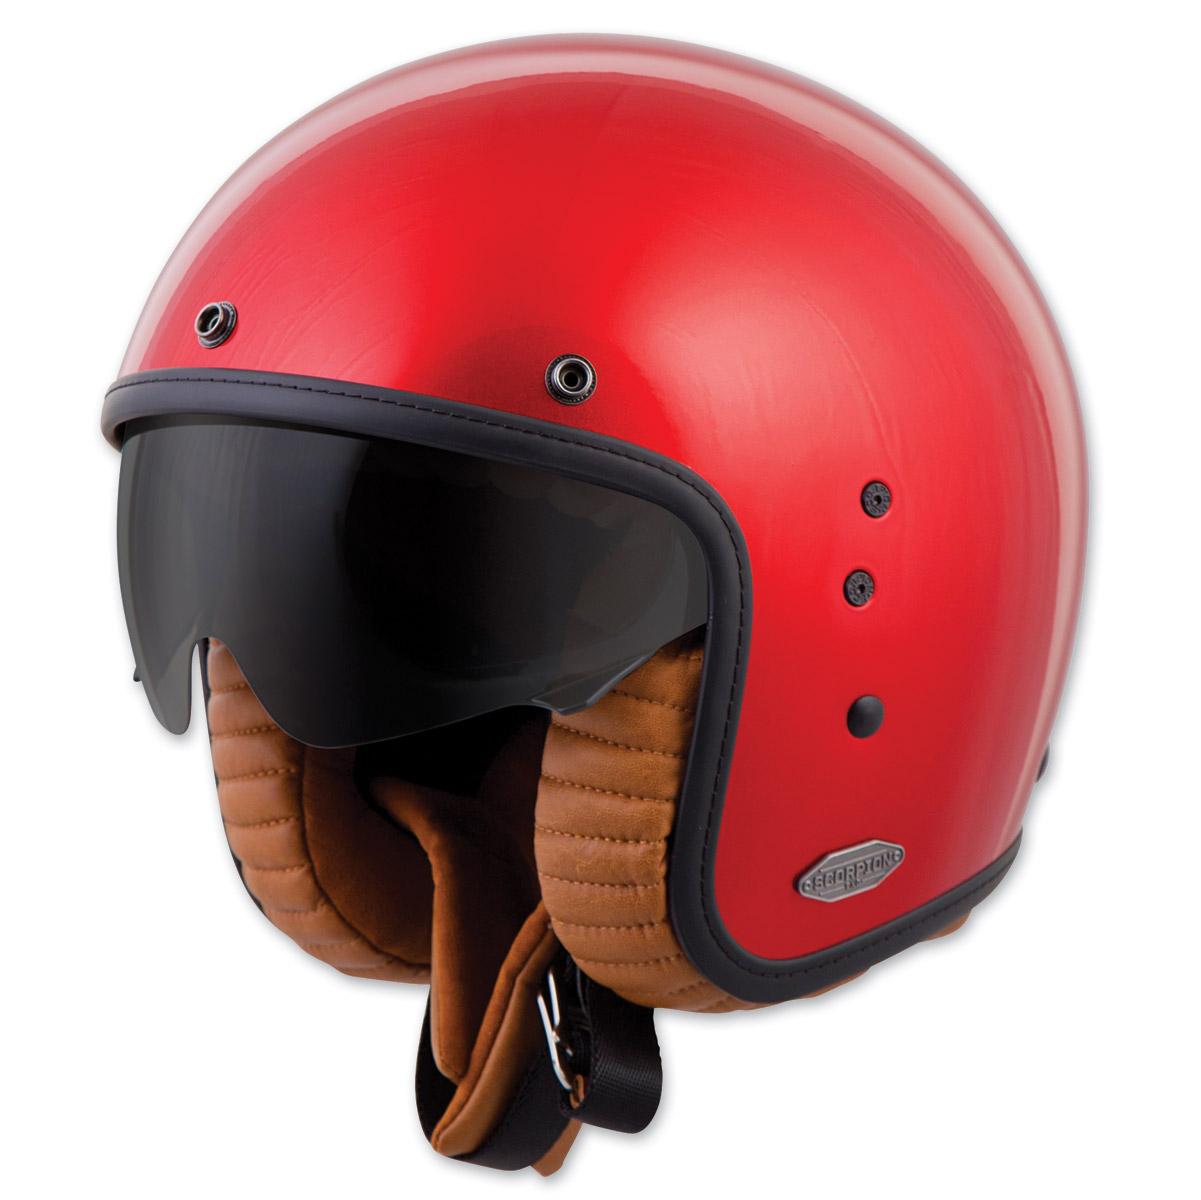 Scorpion EXO Belfast Solid Candy Red Open Face Helmet